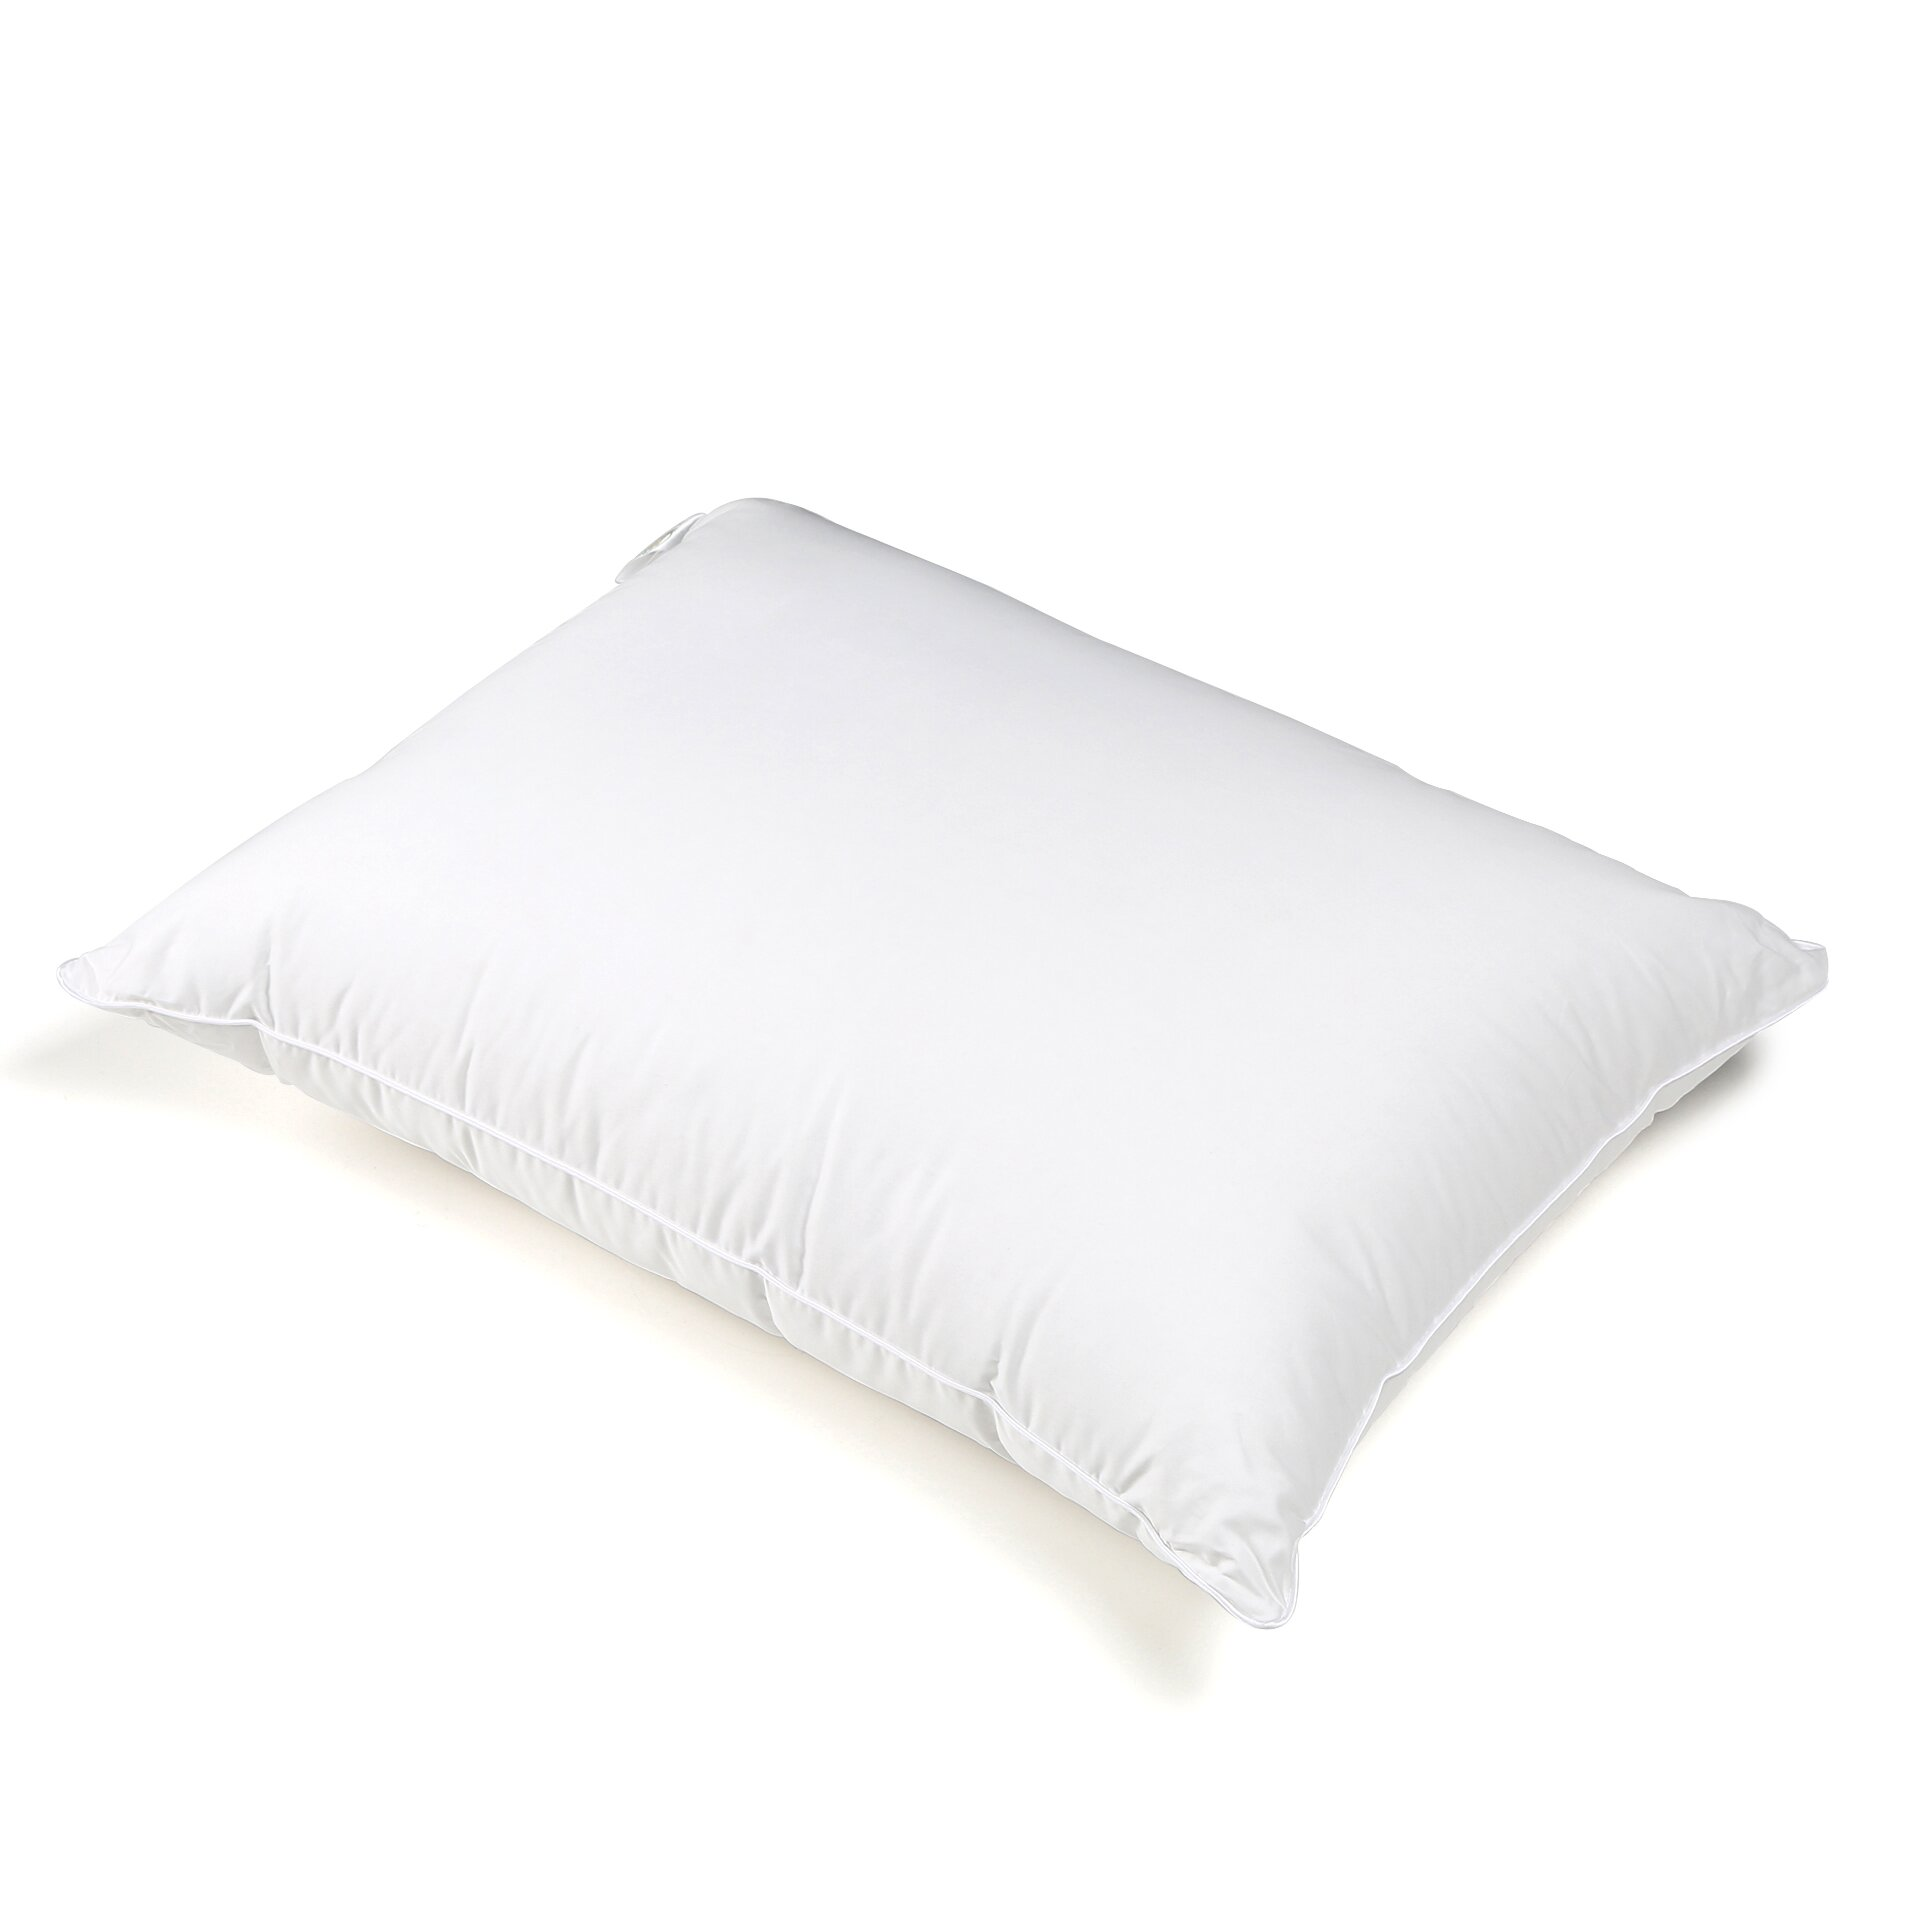 Downright Himalaya 800 Goose Down Pillow Reviews